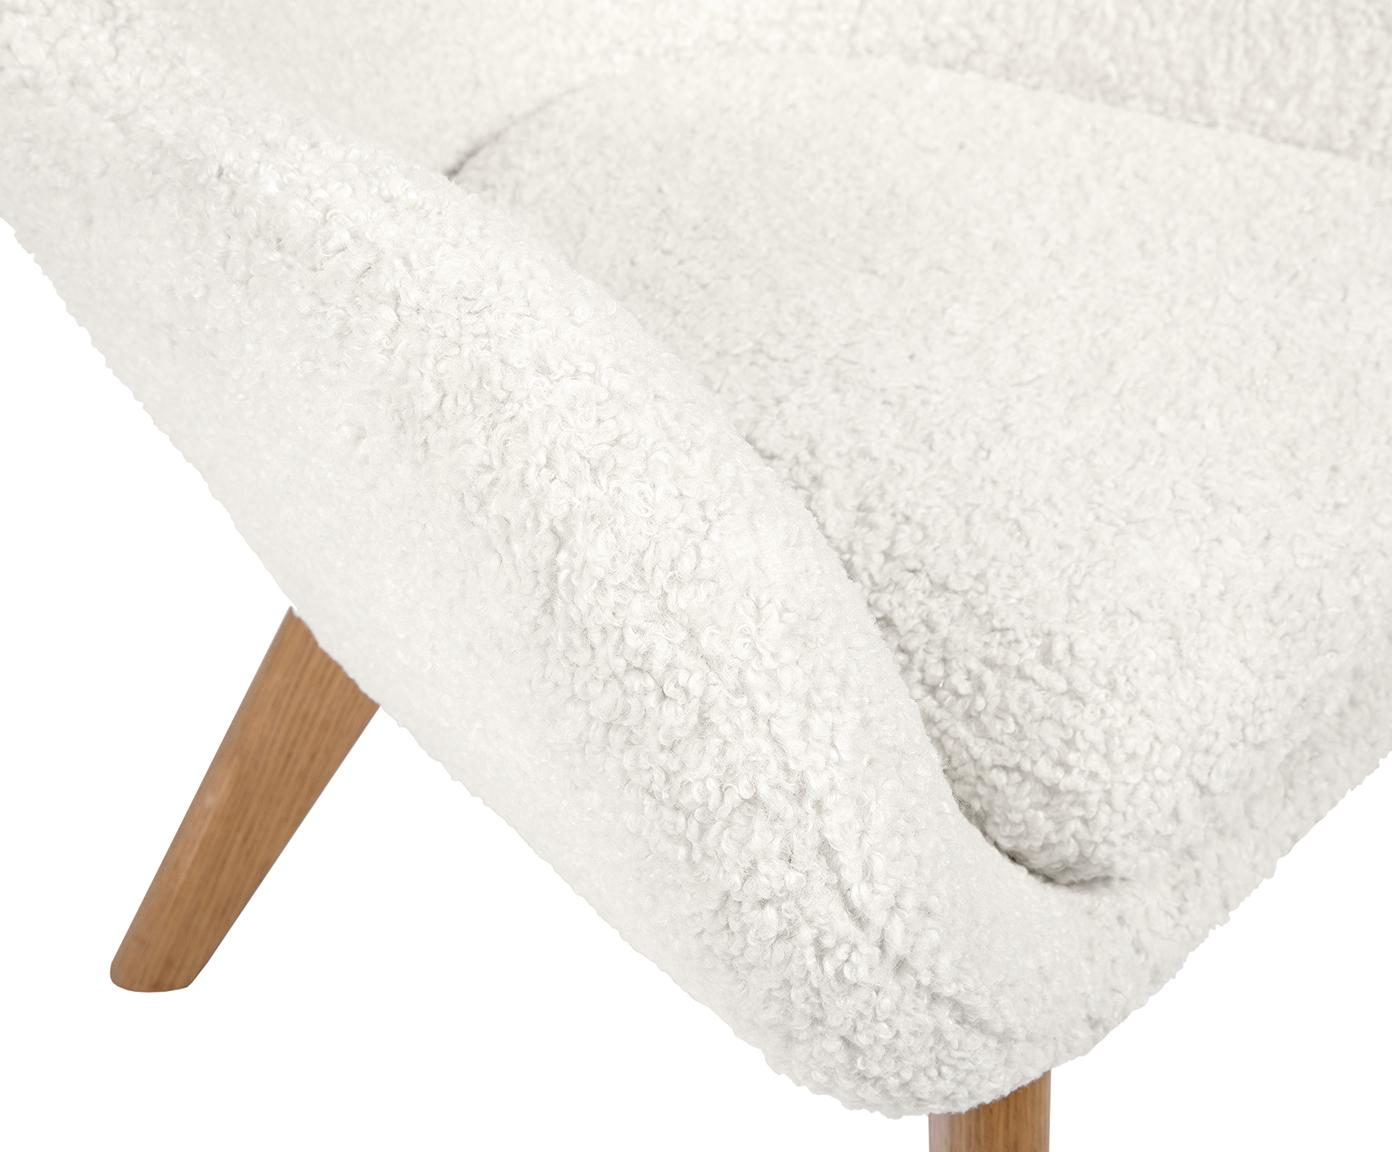 Teddy fauteuil Wing, Bekleding: polyester (teddy), Poten: gelakt massief hout met e, Crème wit, B 77 x D 89 cm